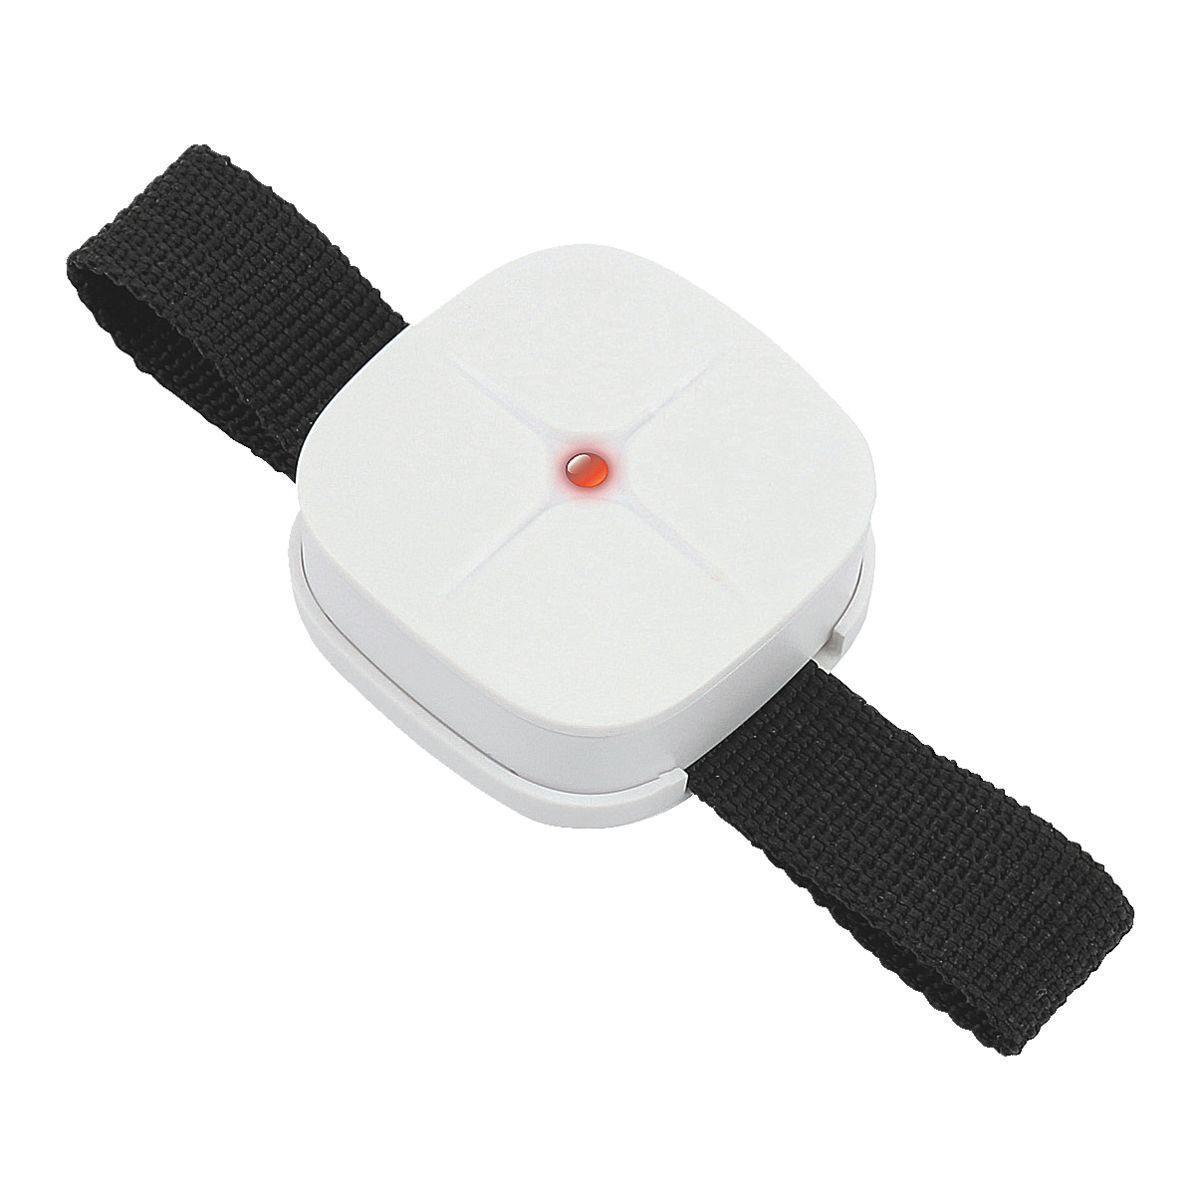 OLYMPIA OFFICE Erschütterungssensor für »Protect-/ProHome-Serie«